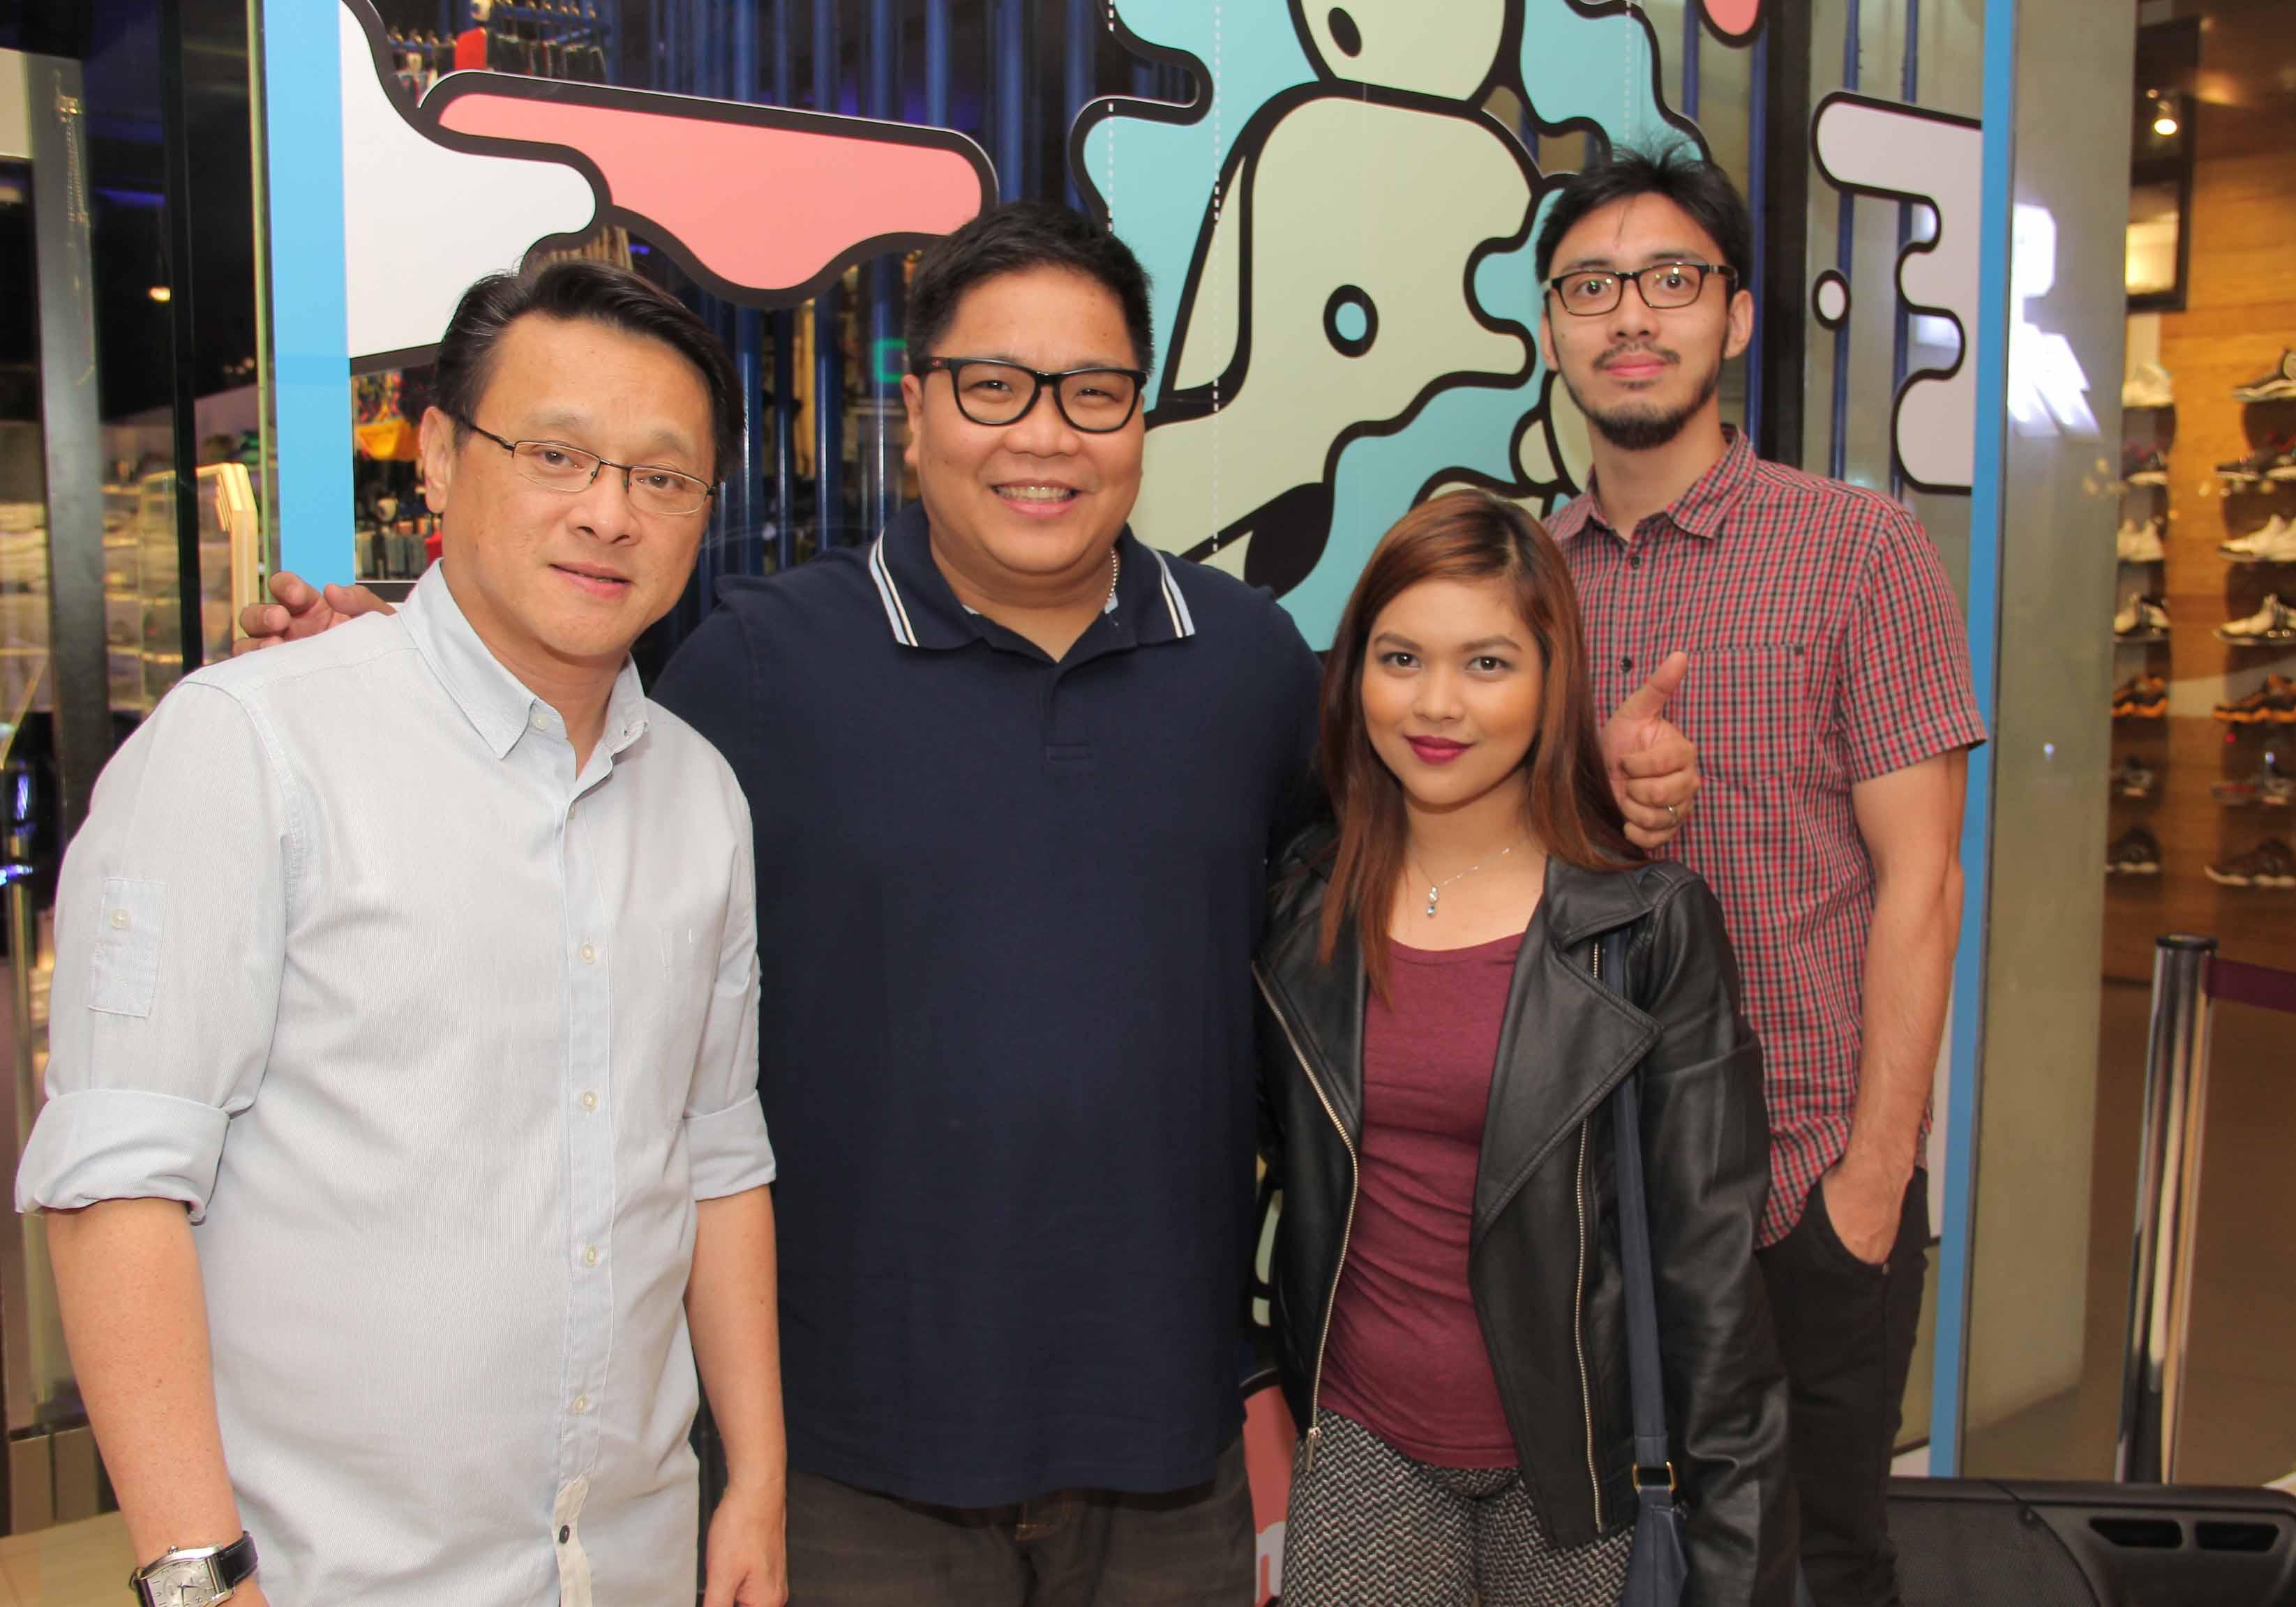 PGII's Managing Director Mr Jhun Uy, Celebrity Host Jugs Jugueta, Primer's Ann Mendoza & Pepe Cervero